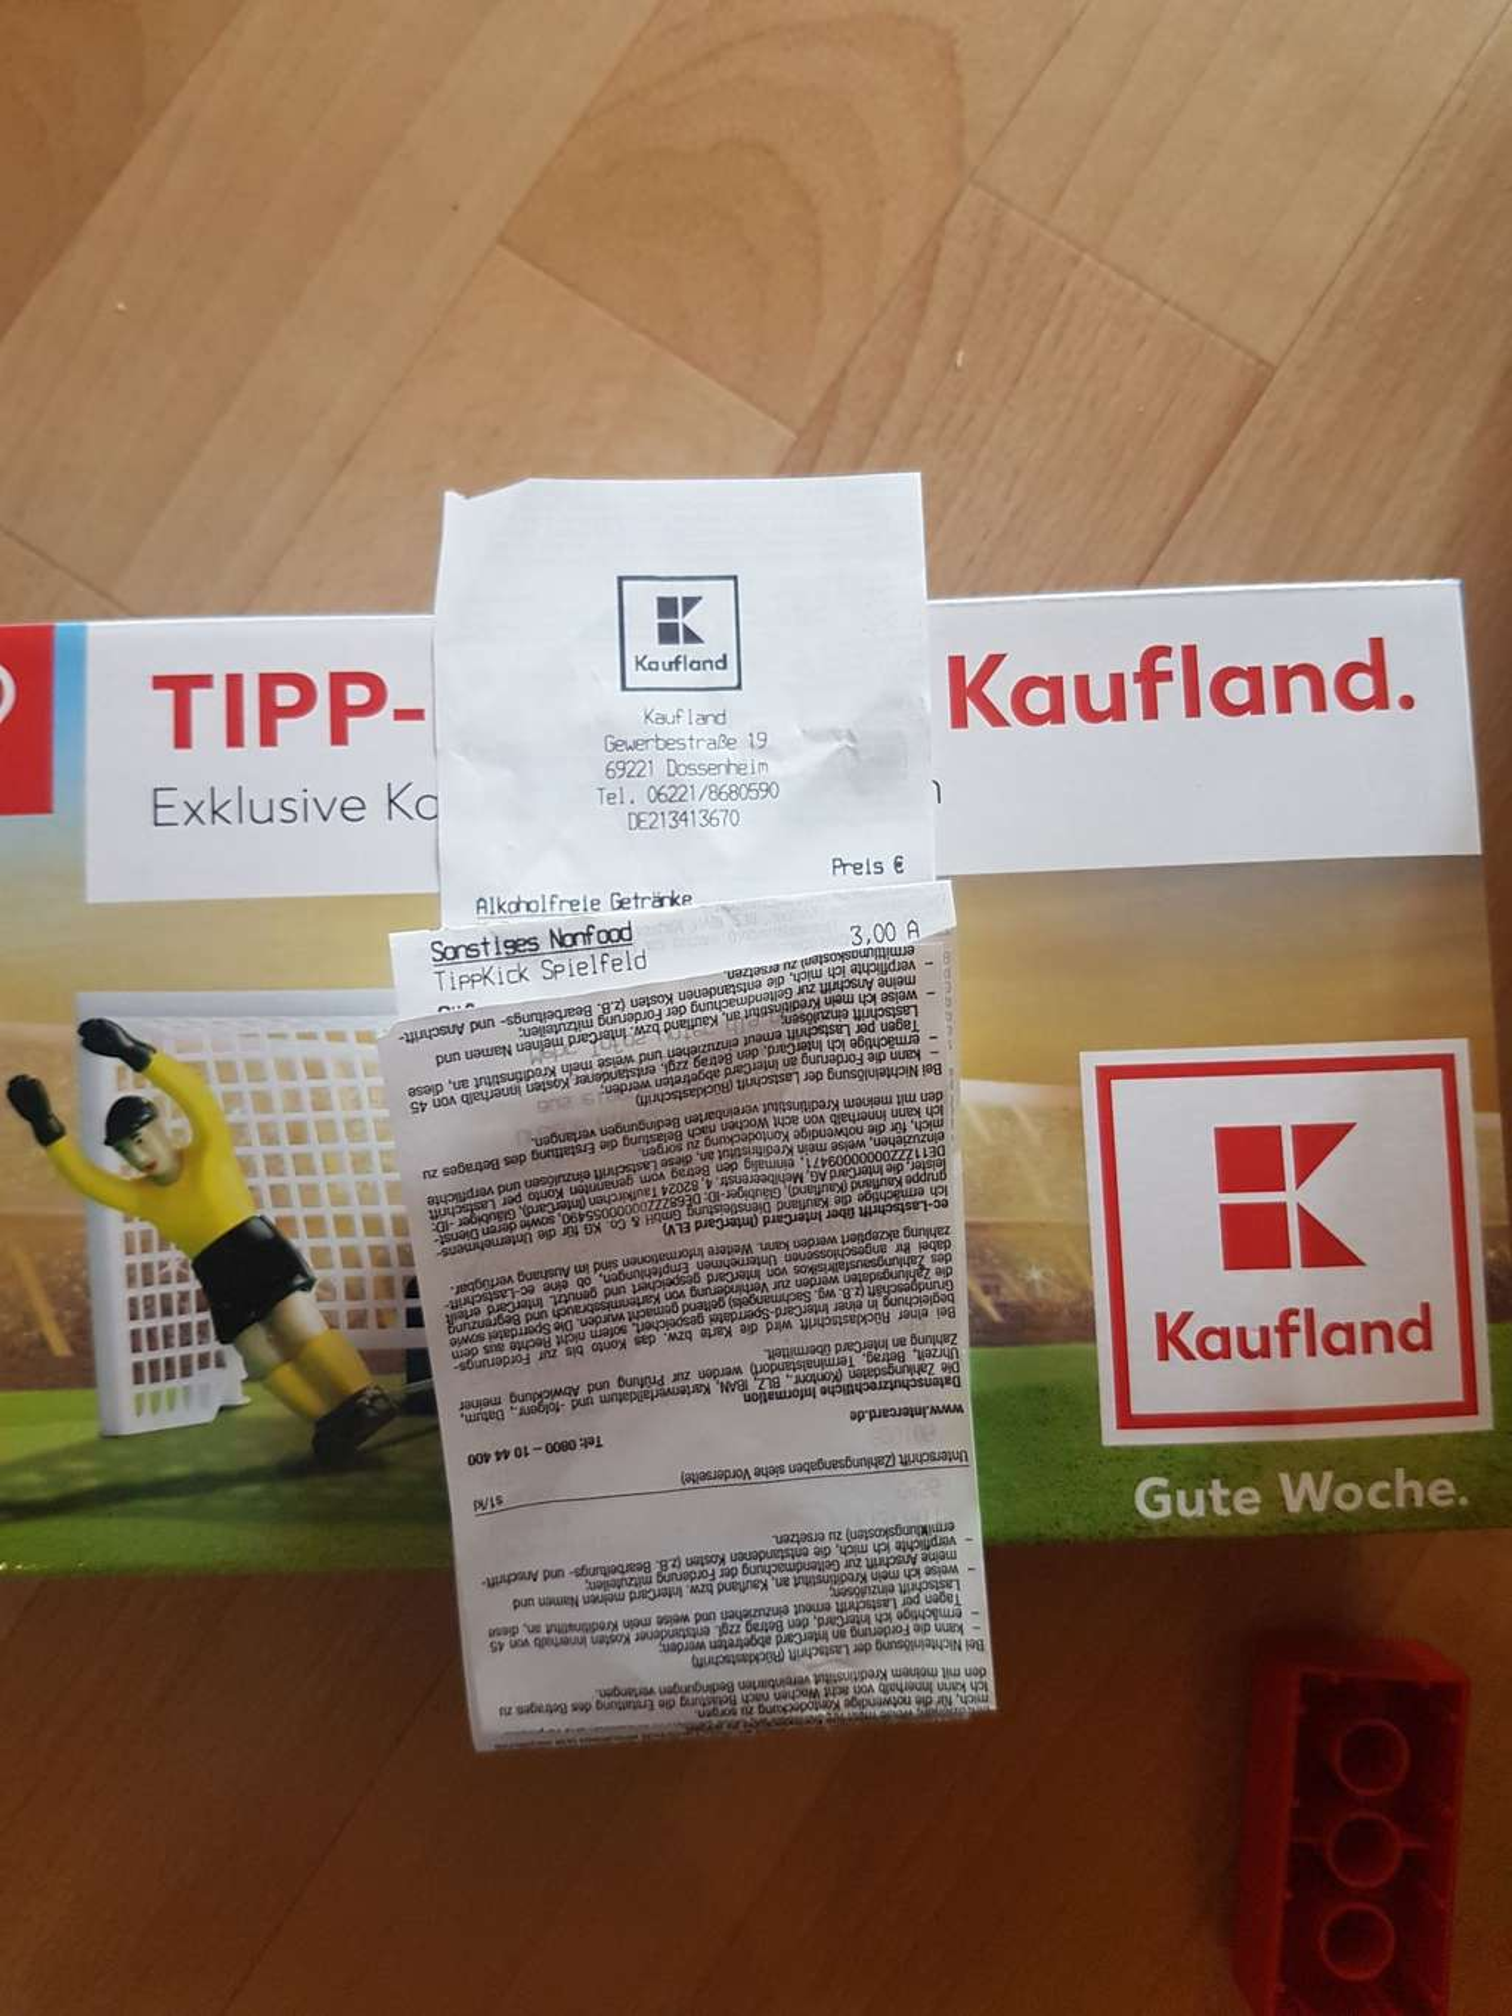 Kaufland Tipp-Kick-Feld - mydealz.de